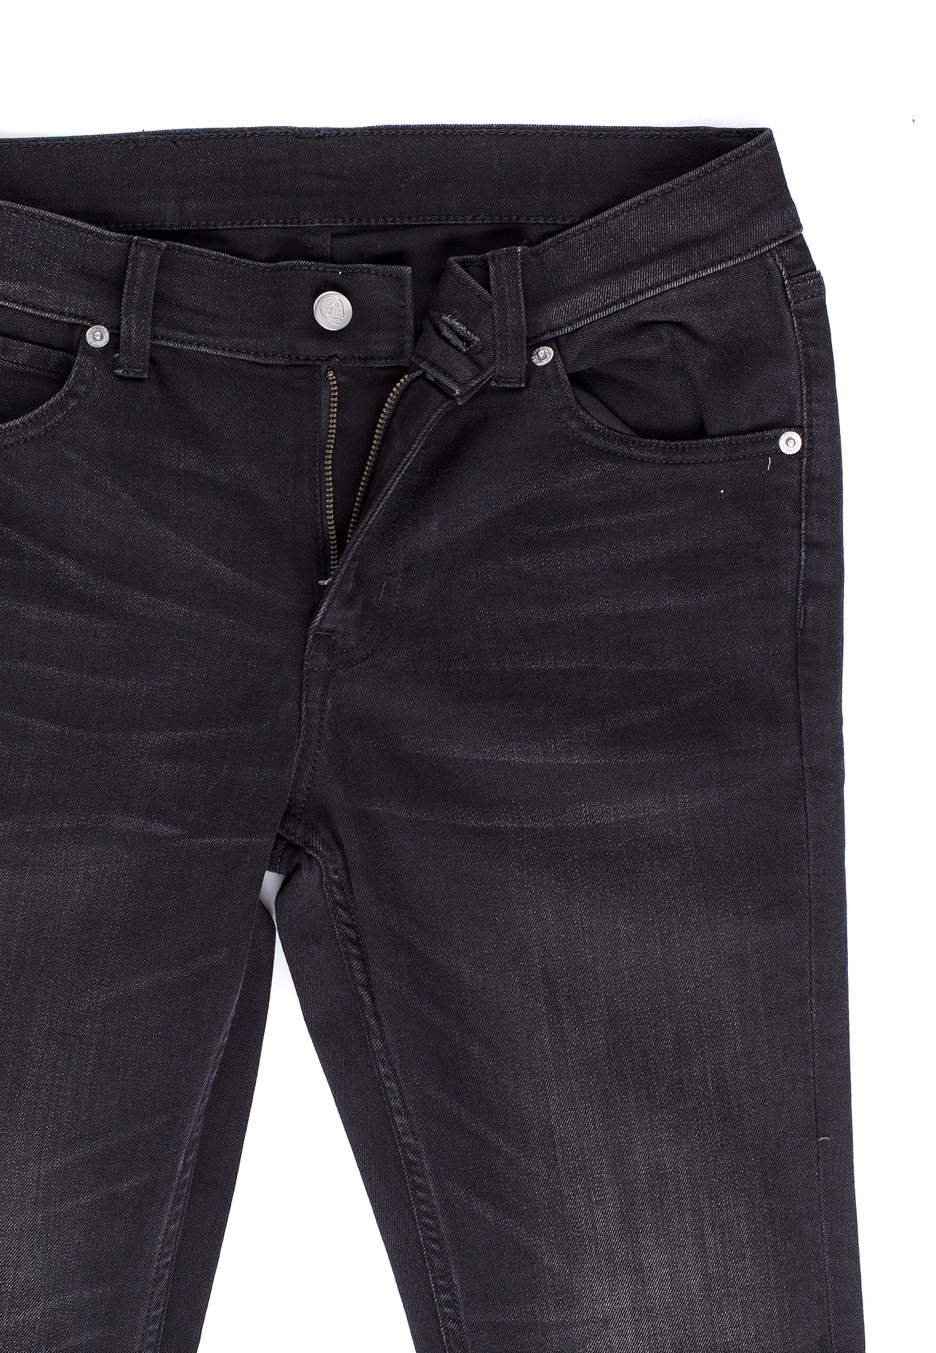 cheap monday tight black market jeans de. Black Bedroom Furniture Sets. Home Design Ideas